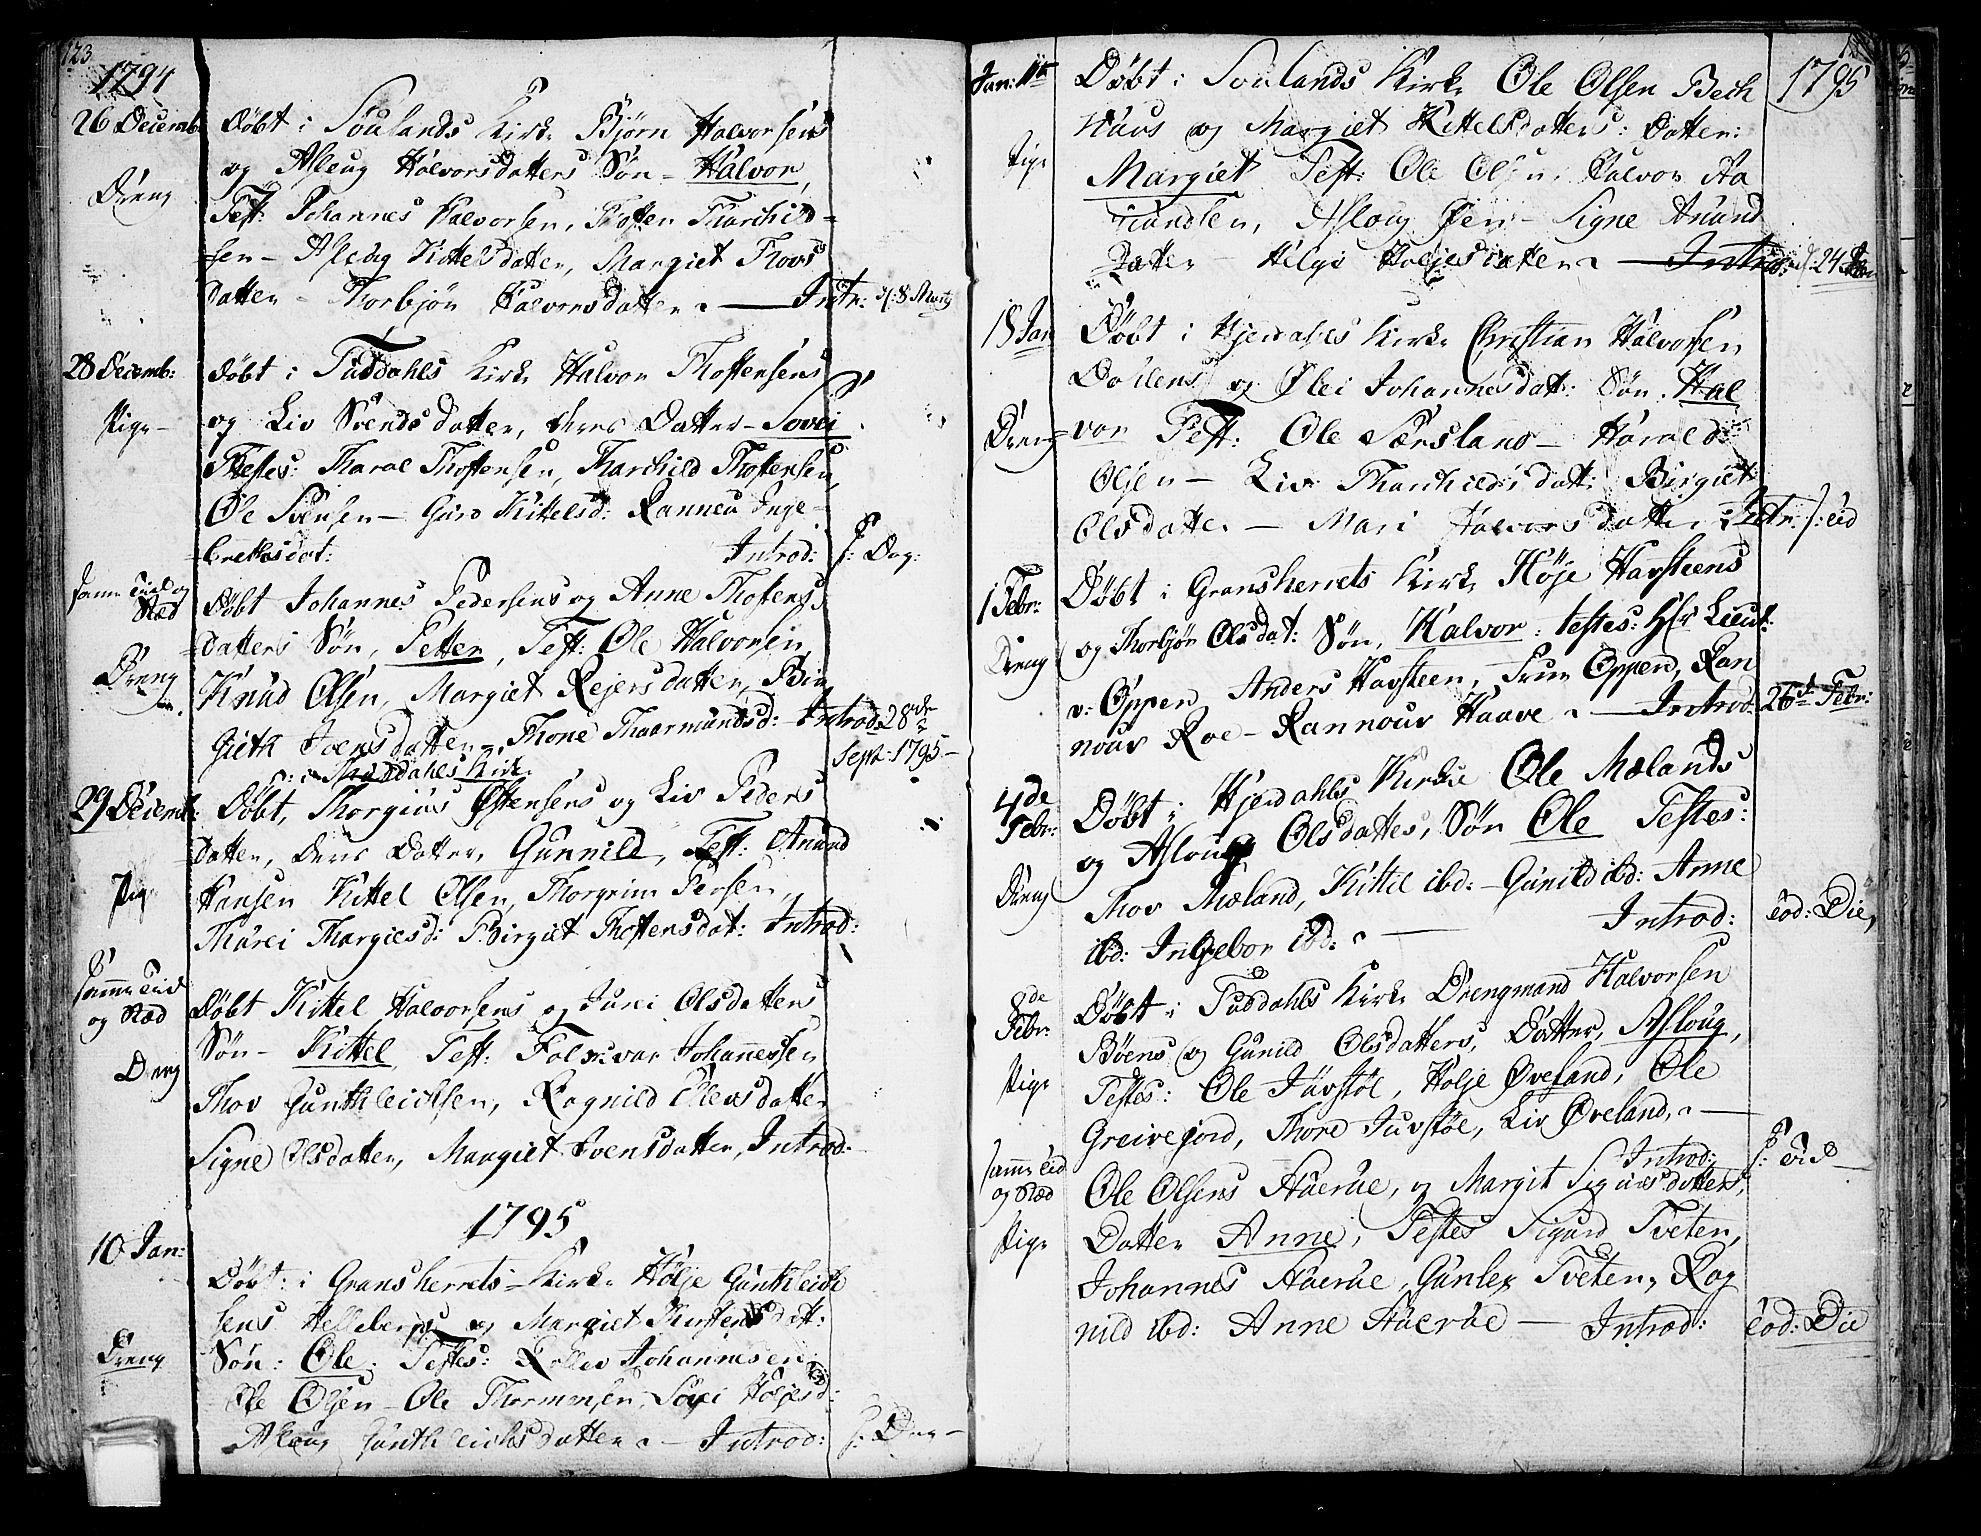 SAKO, Hjartdal kirkebøker, F/Fa/L0005: Ministerialbok nr. I 5, 1776-1801, s. 123-124